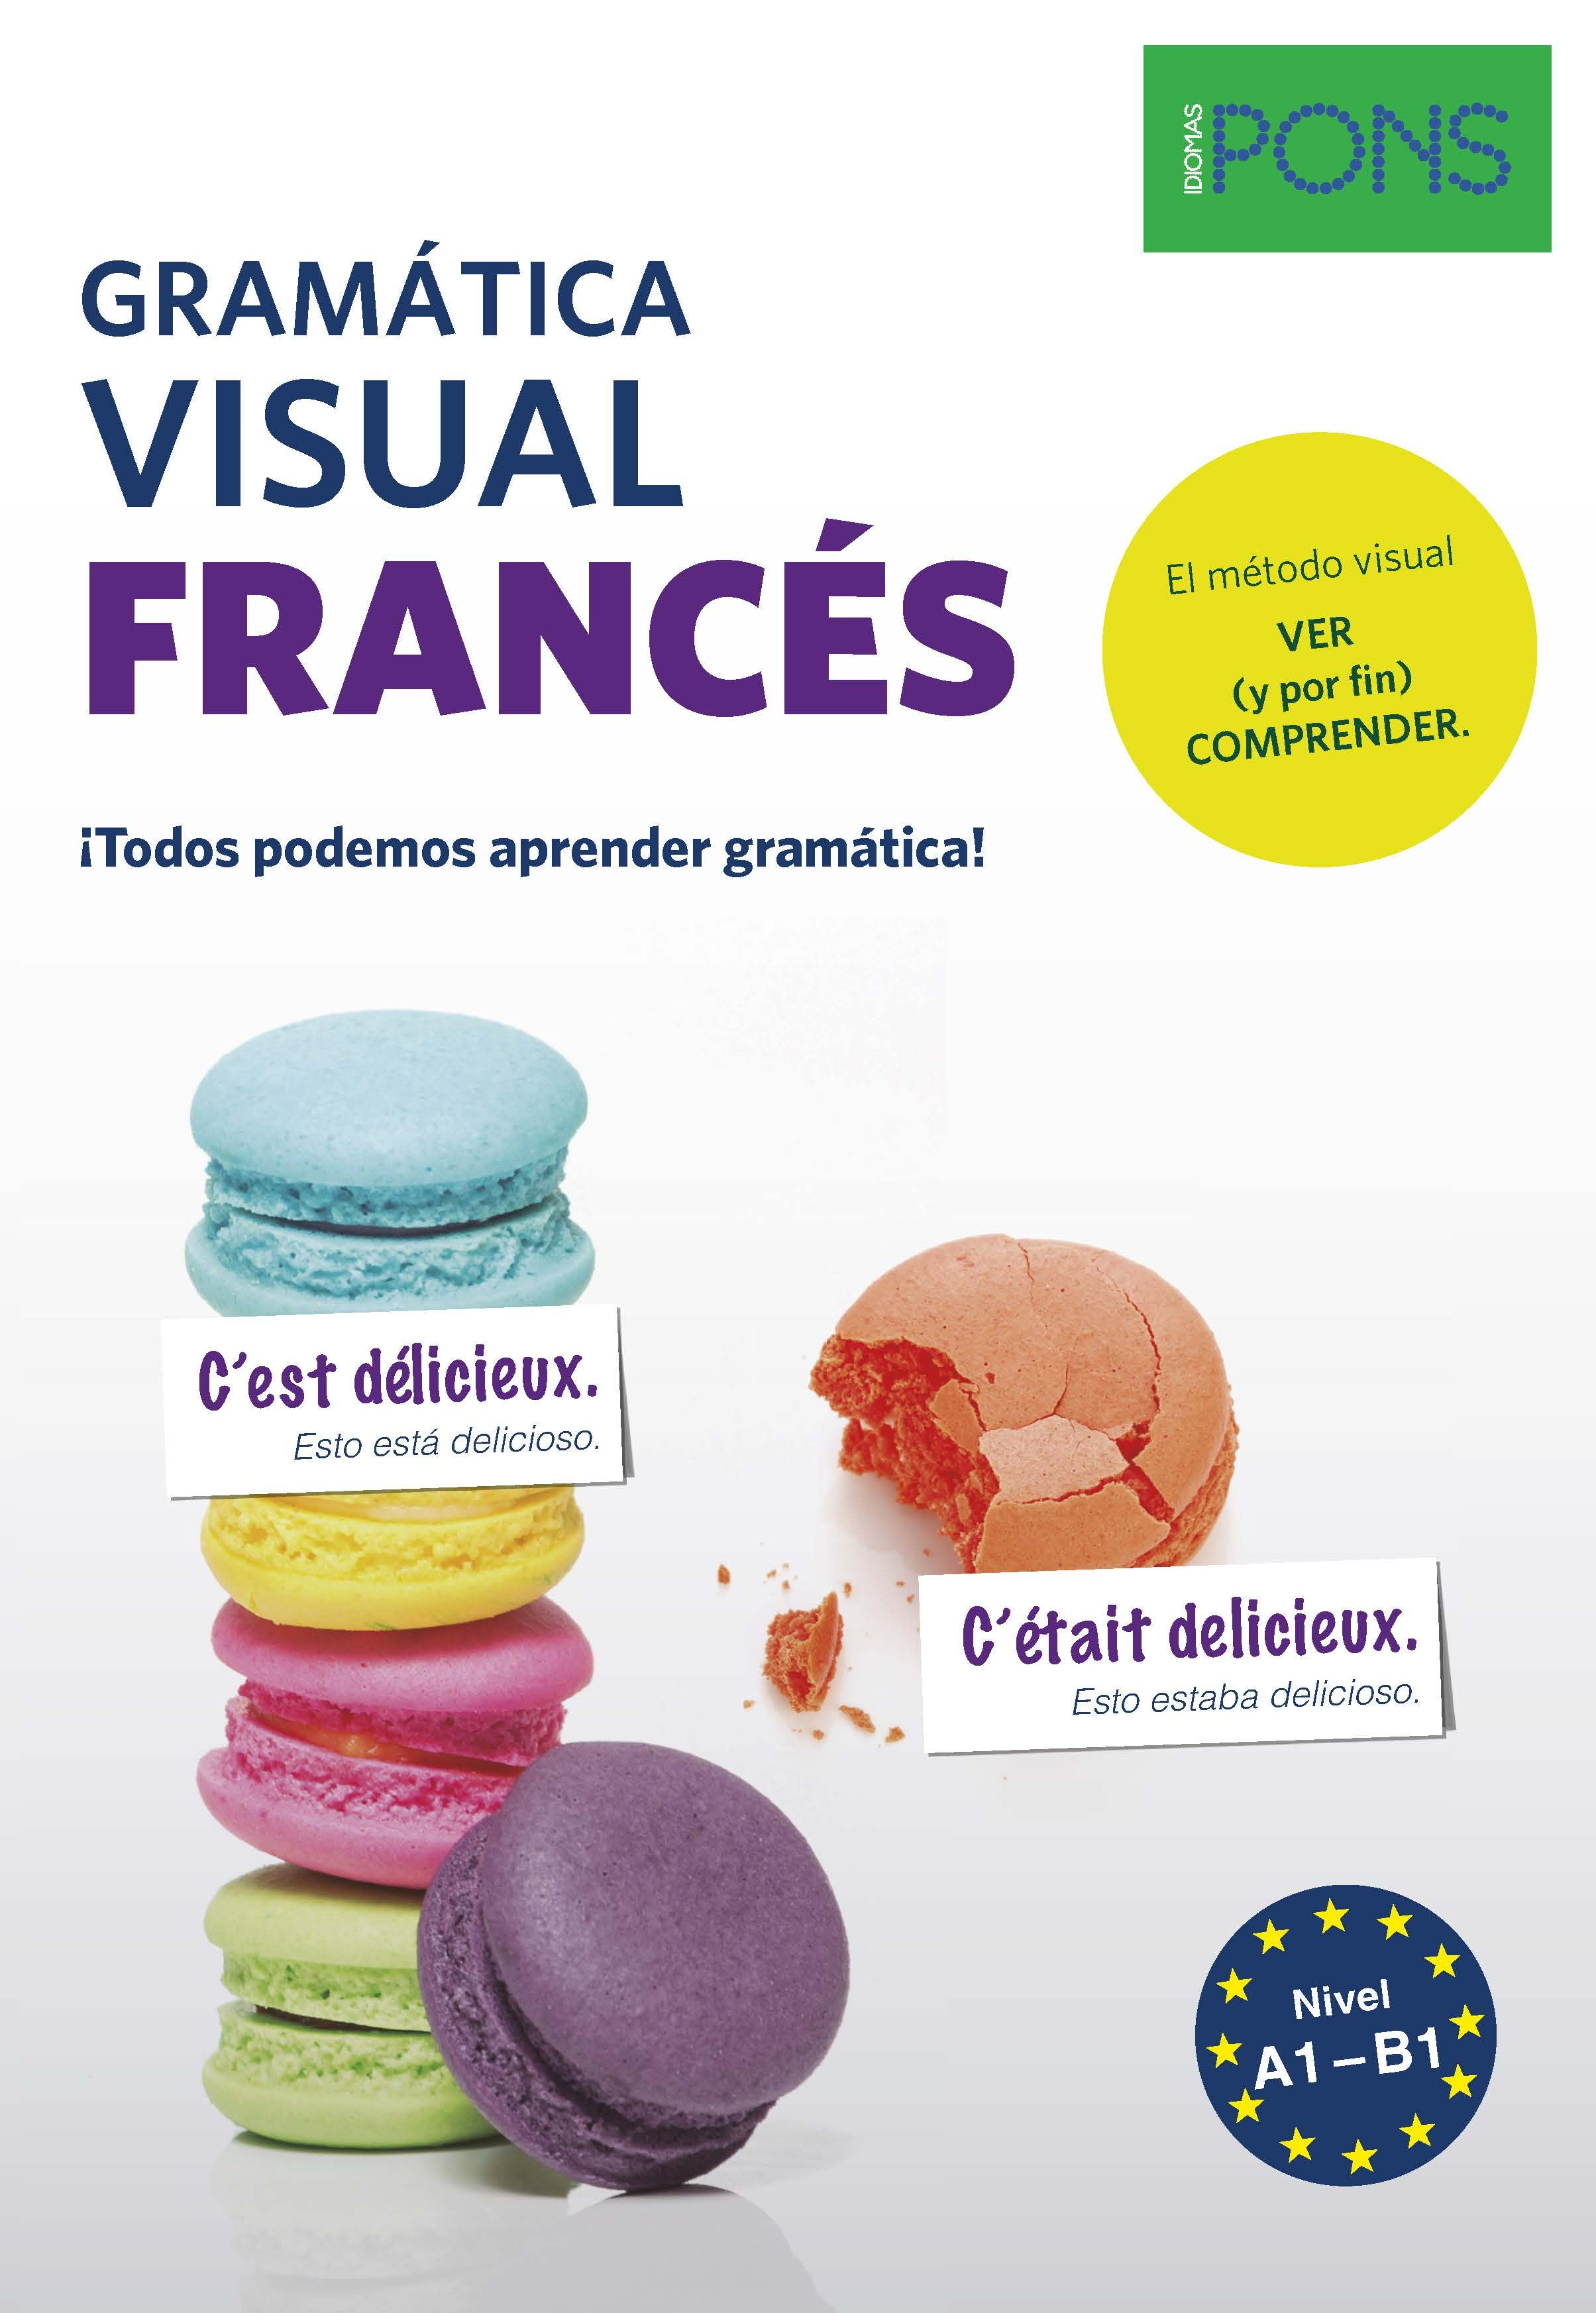 GRAMATICA VISUAL FRANCES PONS